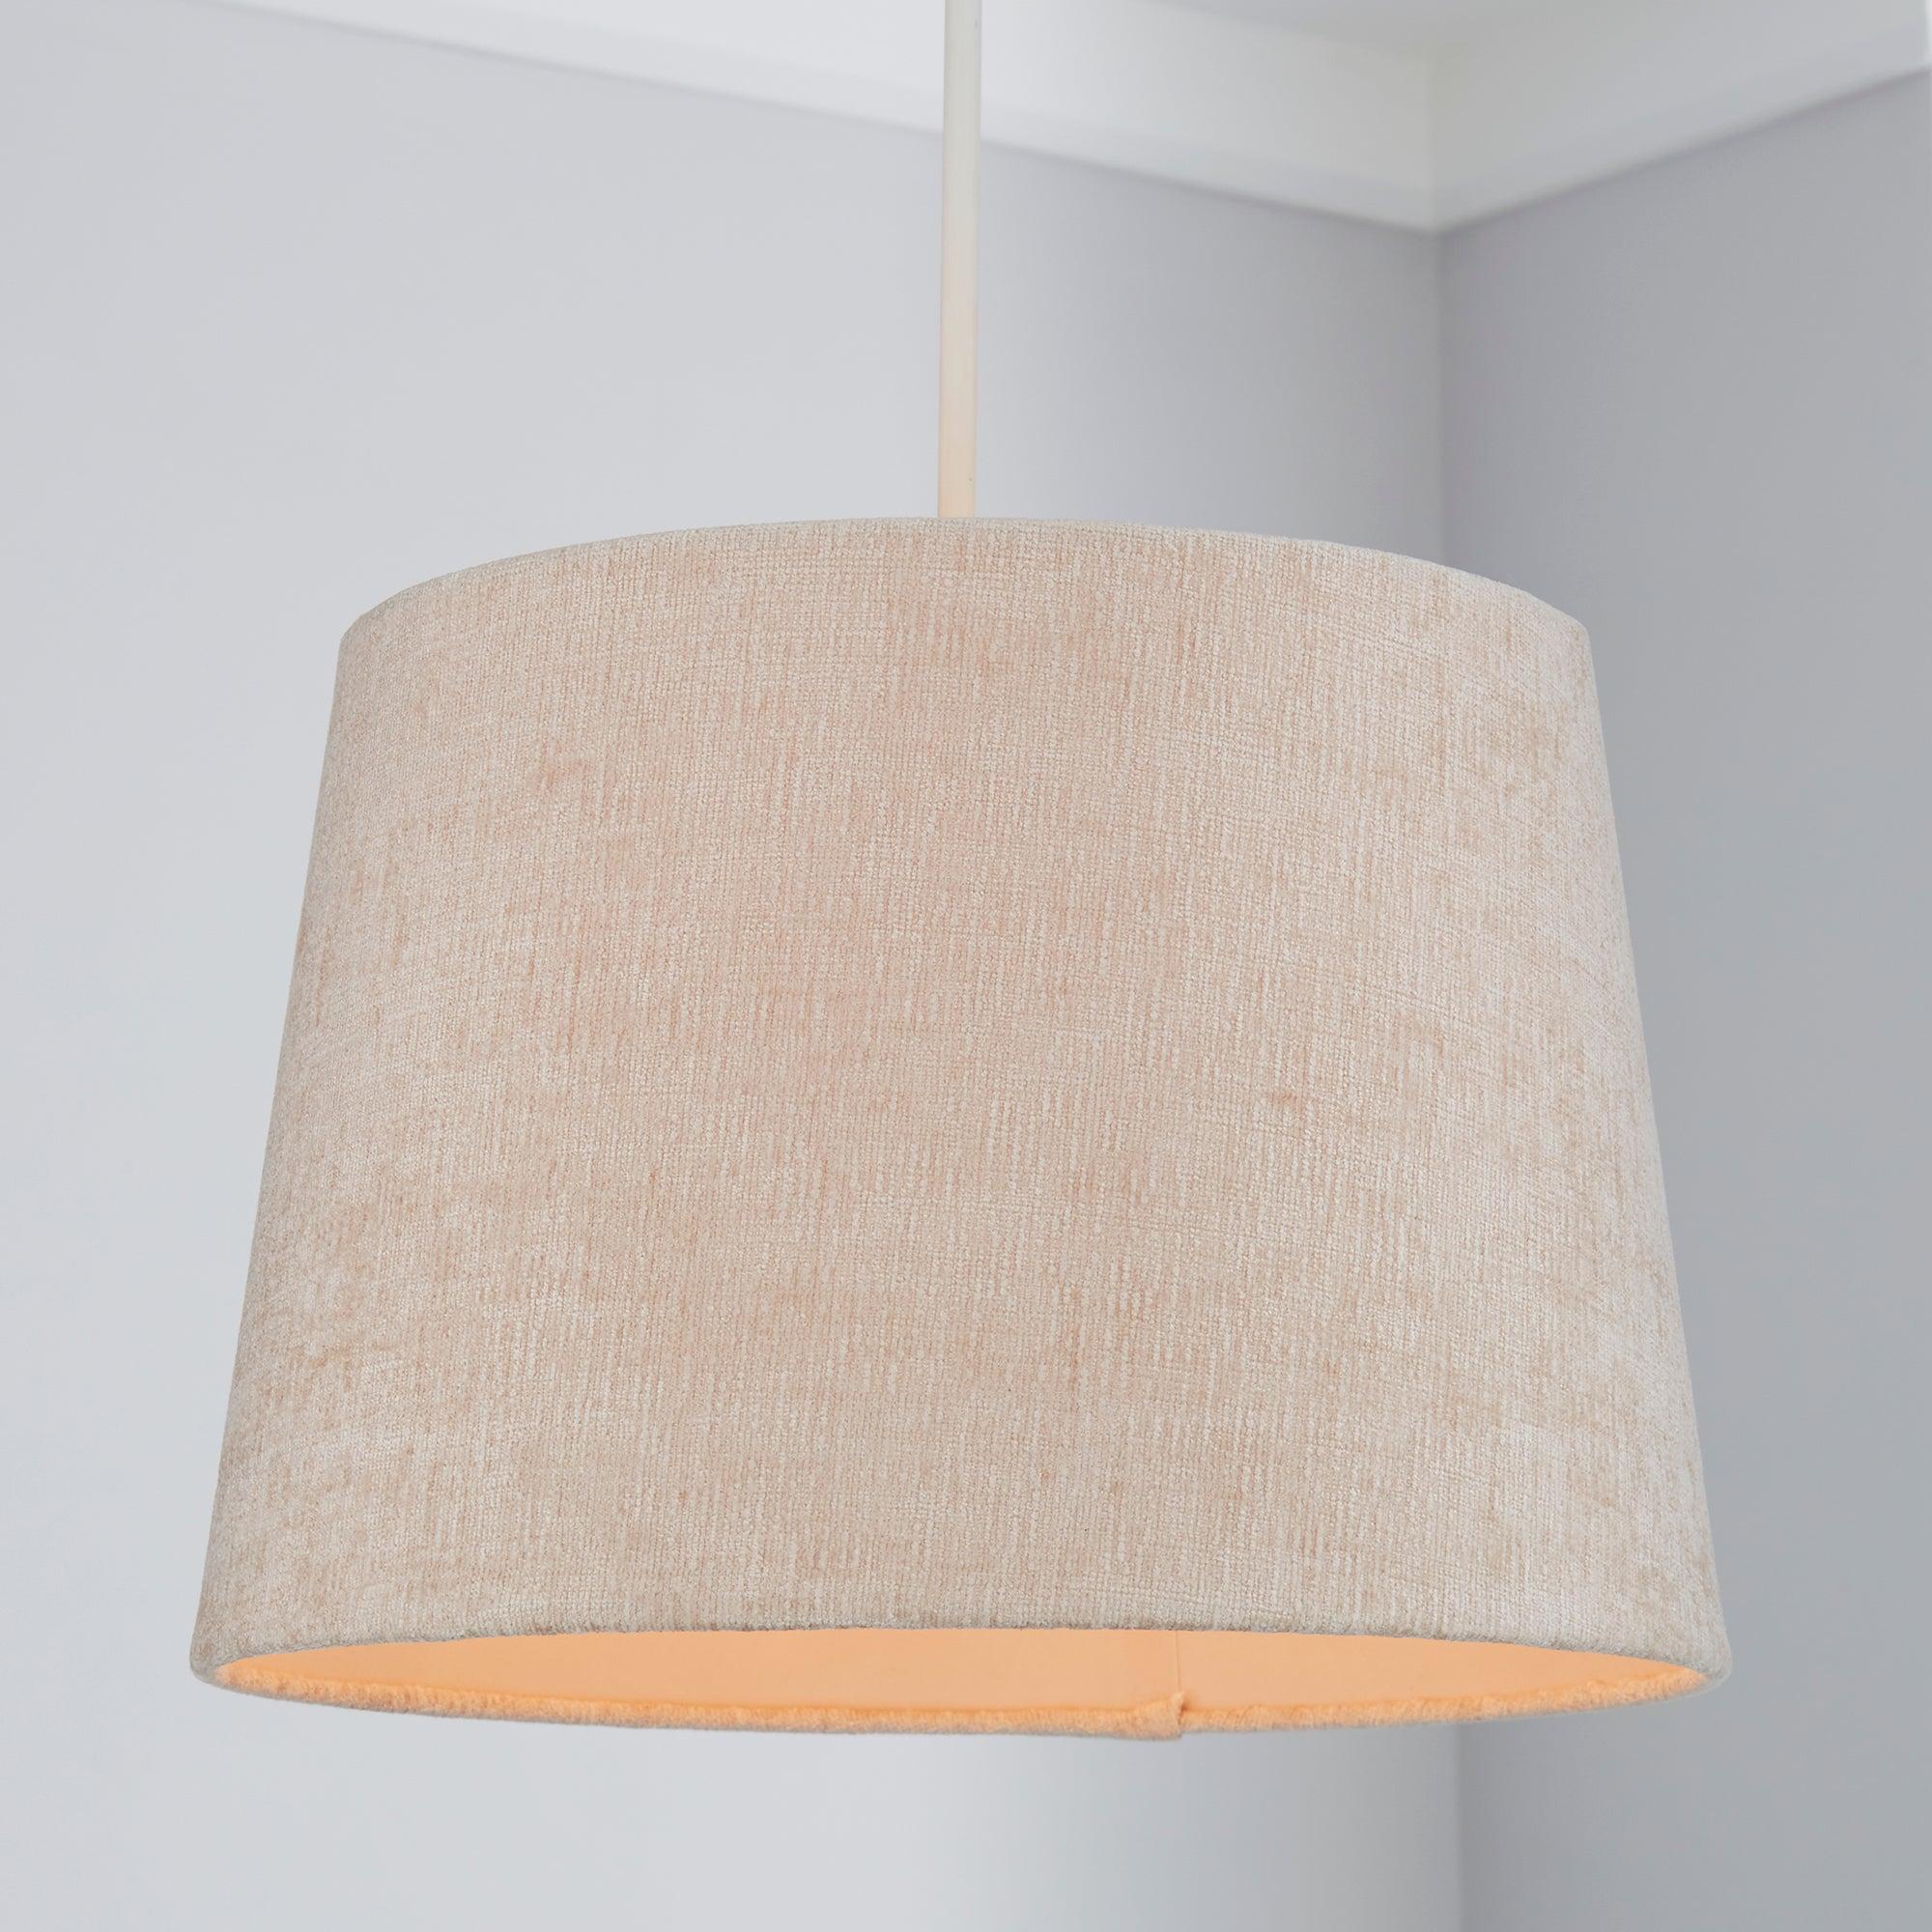 Photo of Mons chenille natural light shade natural